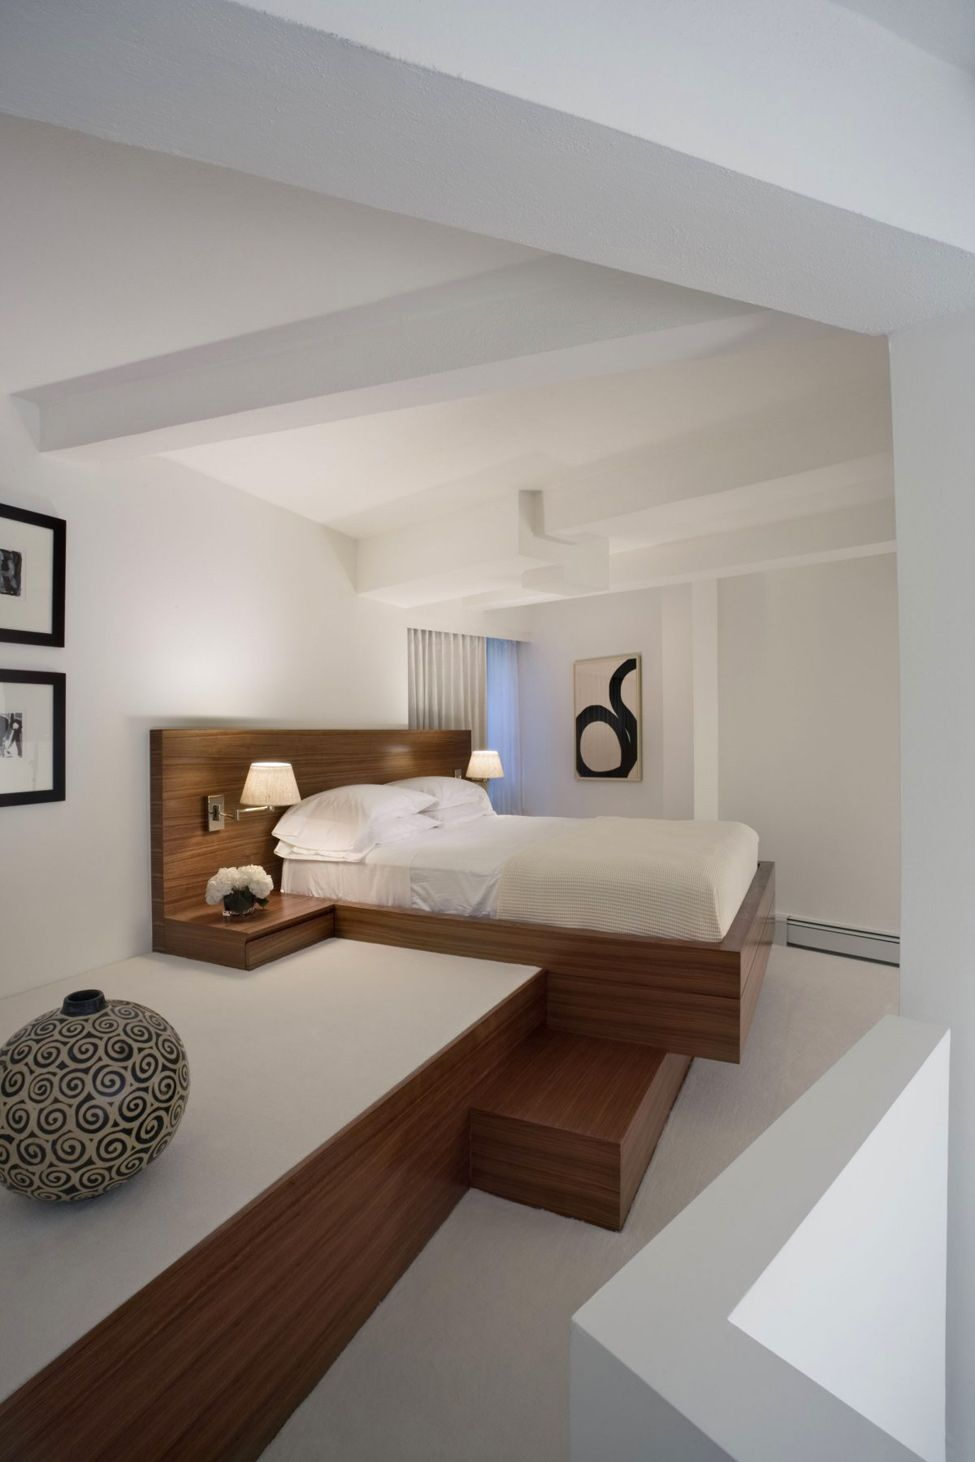 Bedroom ideas for loft rooms   Barrow Street Loft u проект от ixdesign  Barrow AFC Lofts